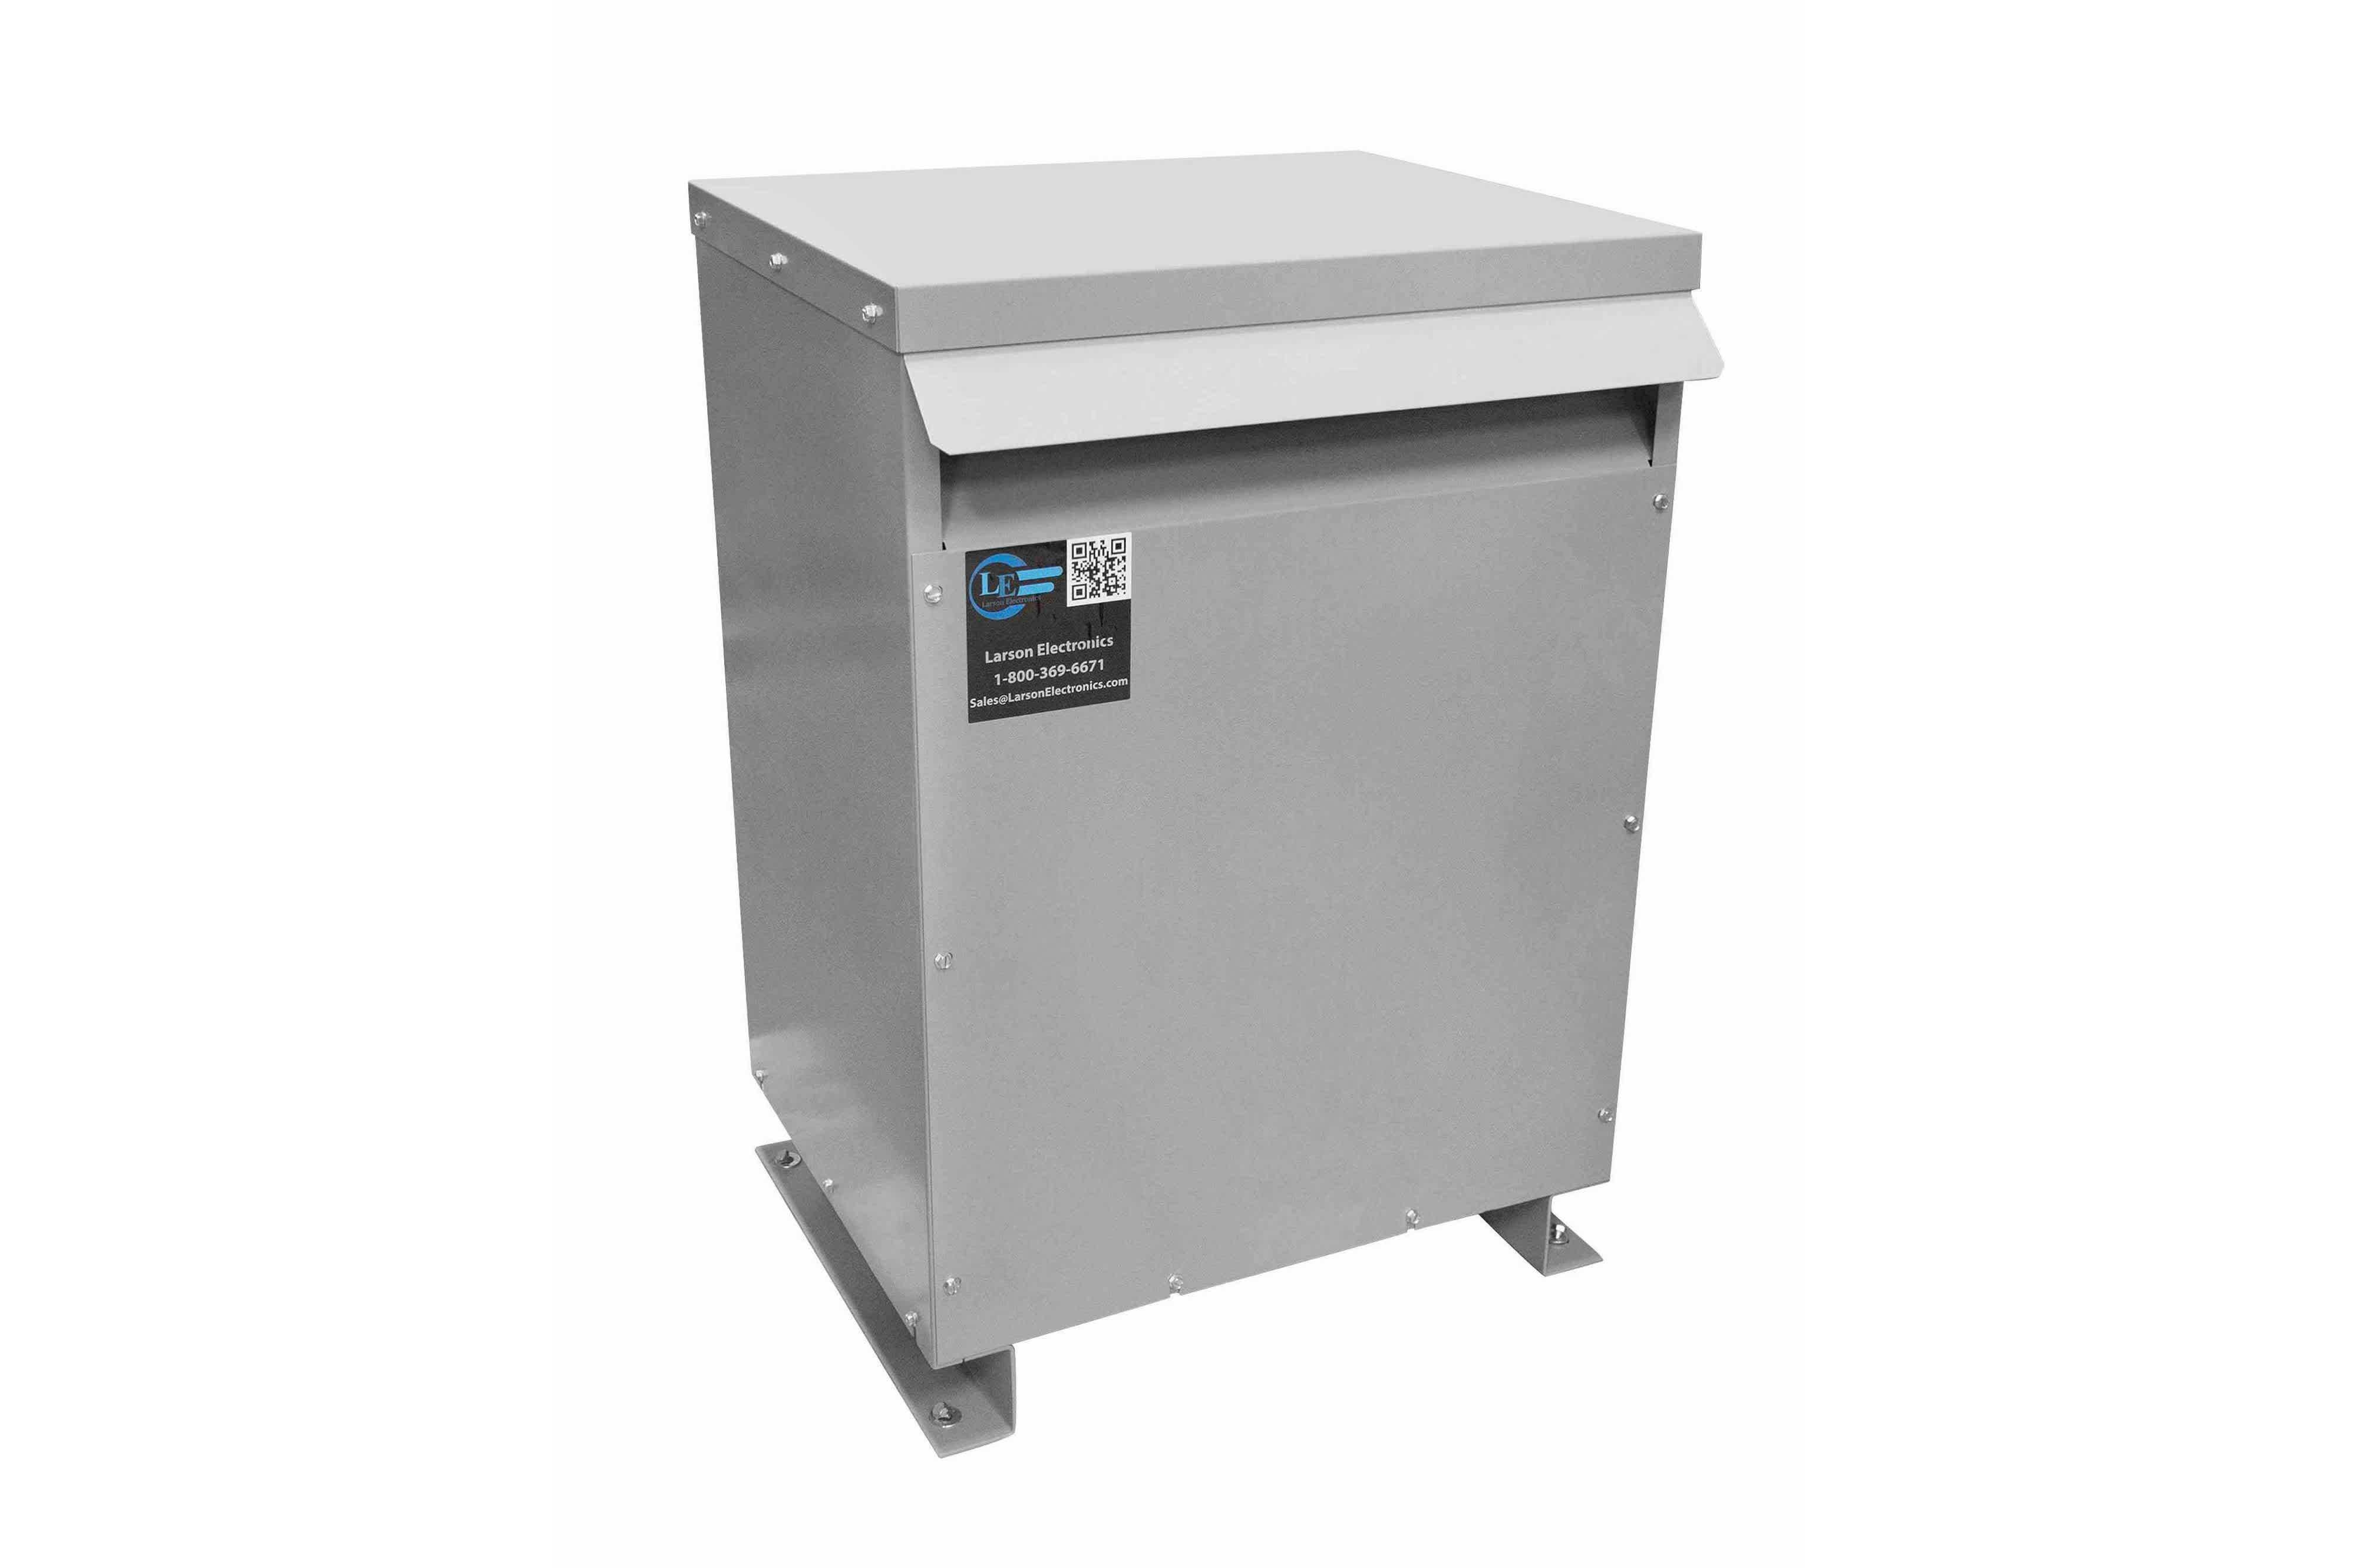 400 kVA 3PH Isolation Transformer, 415V Wye Primary, 480Y/277 Wye-N Secondary, N3R, Ventilated, 60 Hz